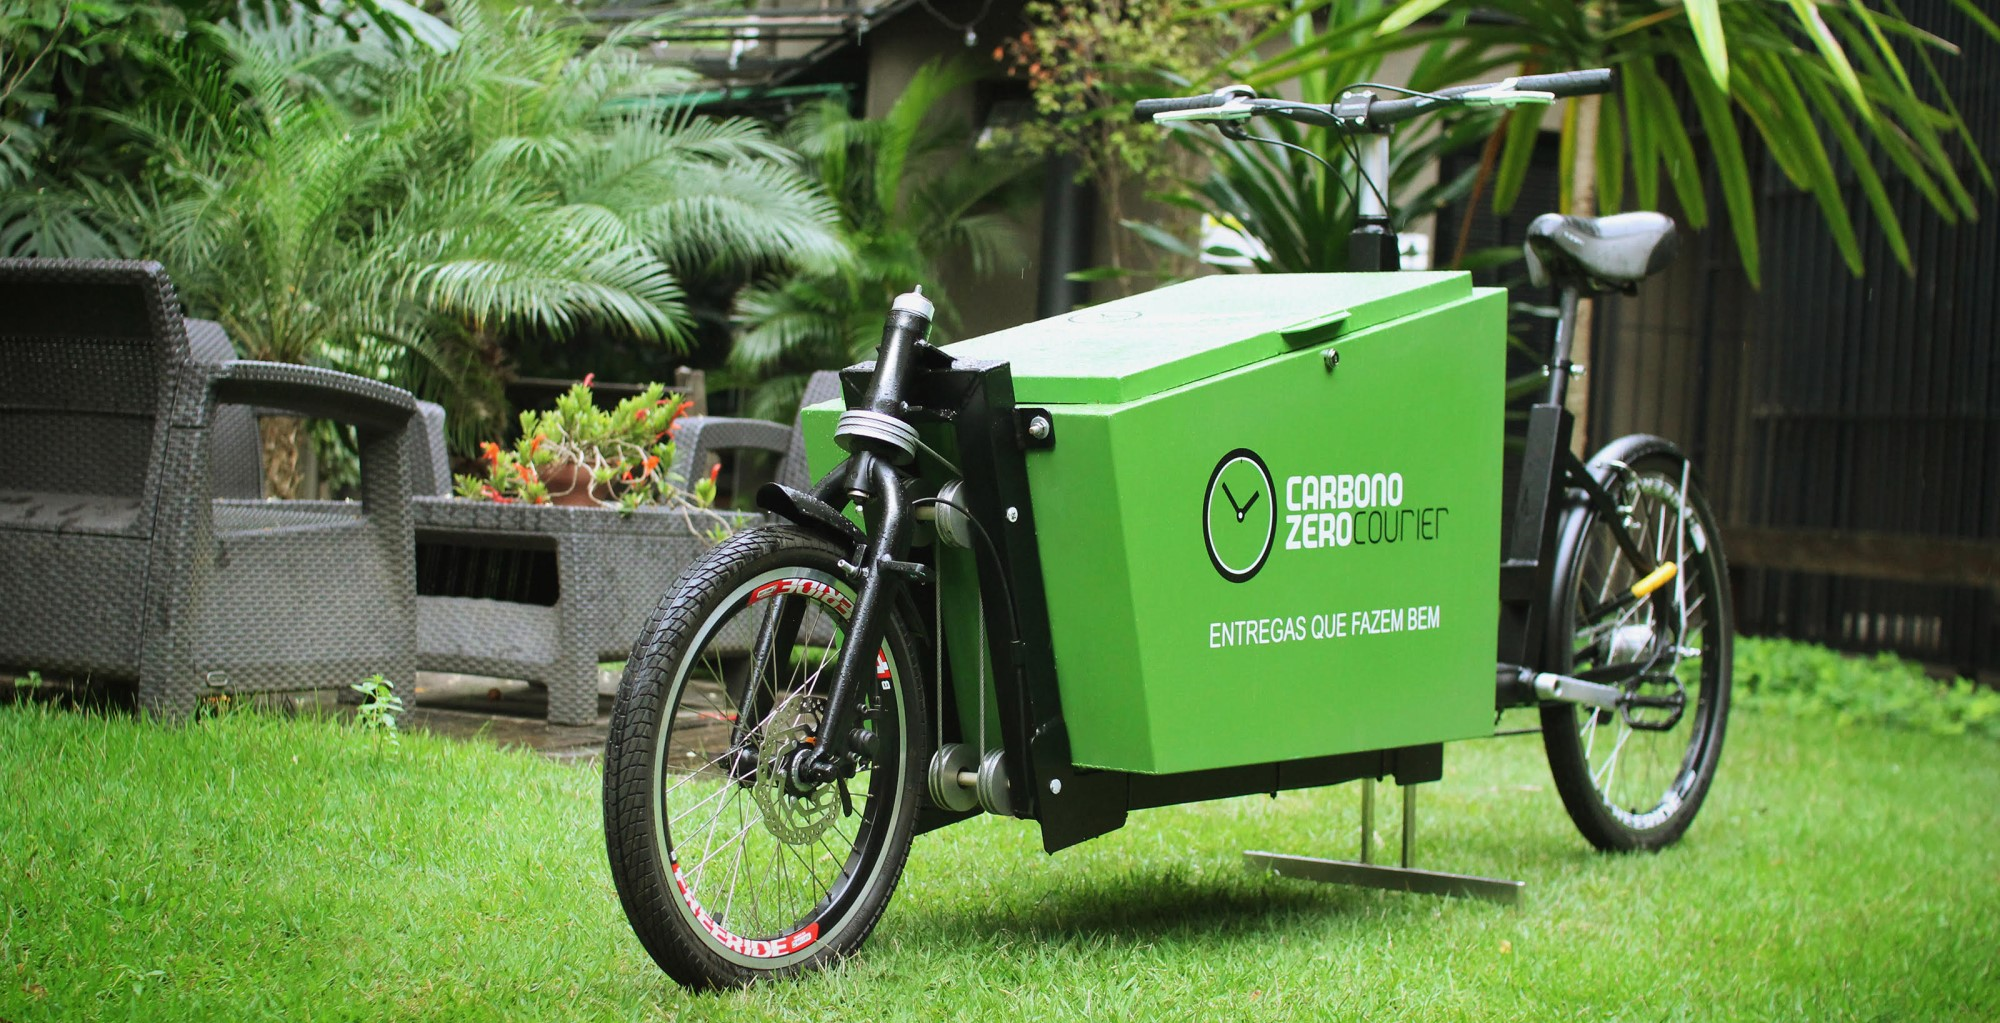 Carbono-Zero_Cargobike2-1